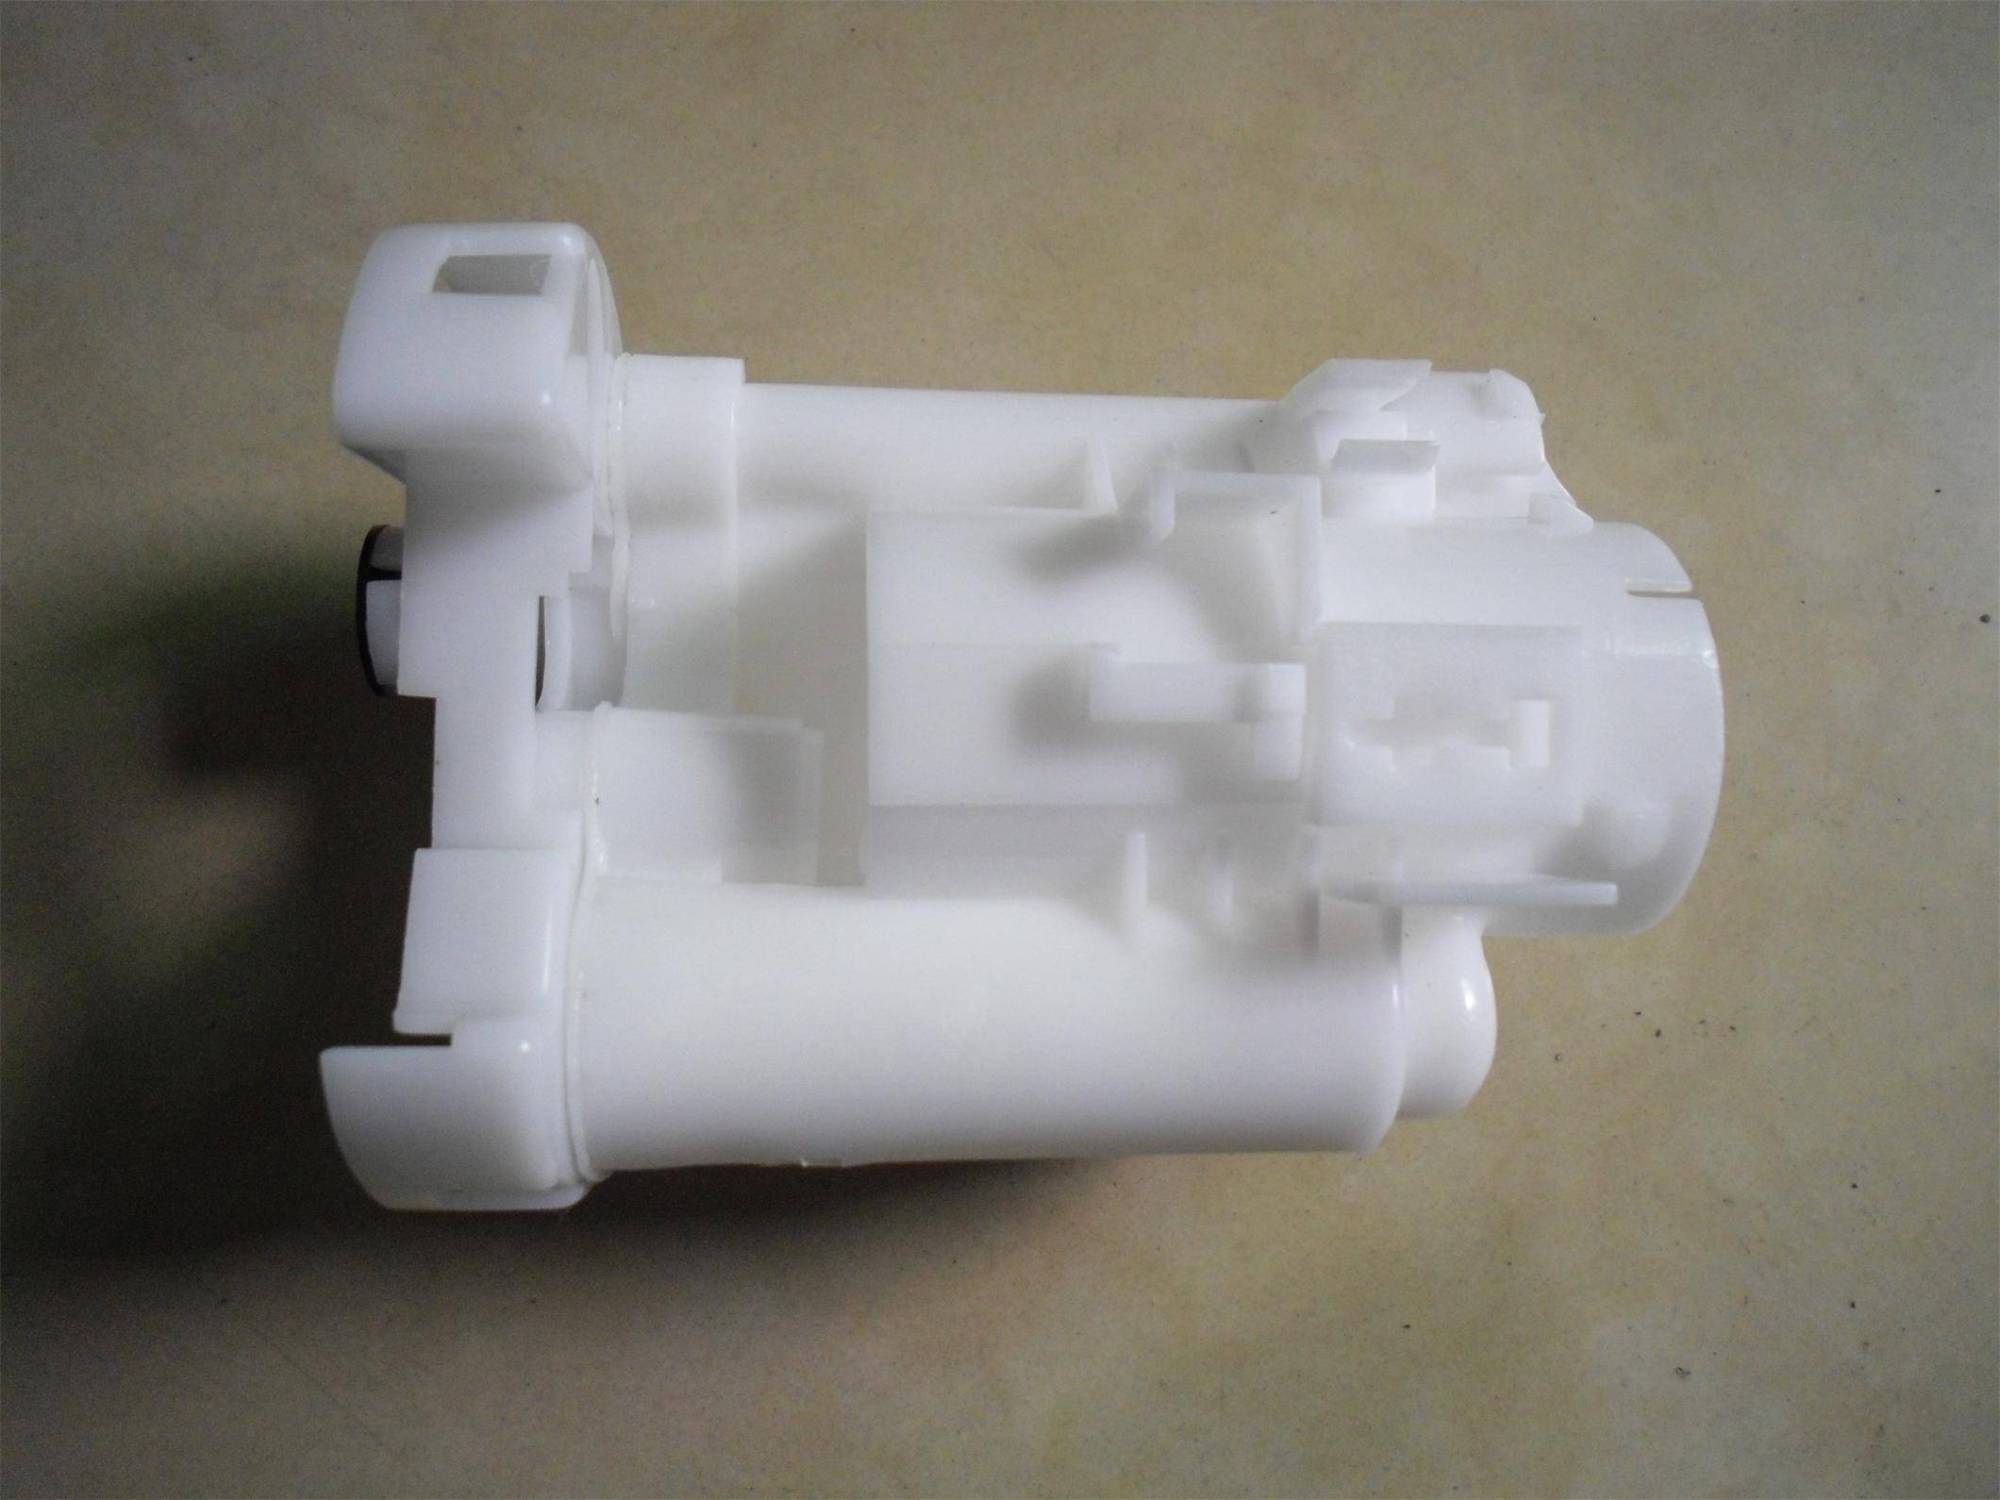 hight resolution of fuel filter 23300 21010 for toyota corolla previa 1mz fe 2az fe 4zz